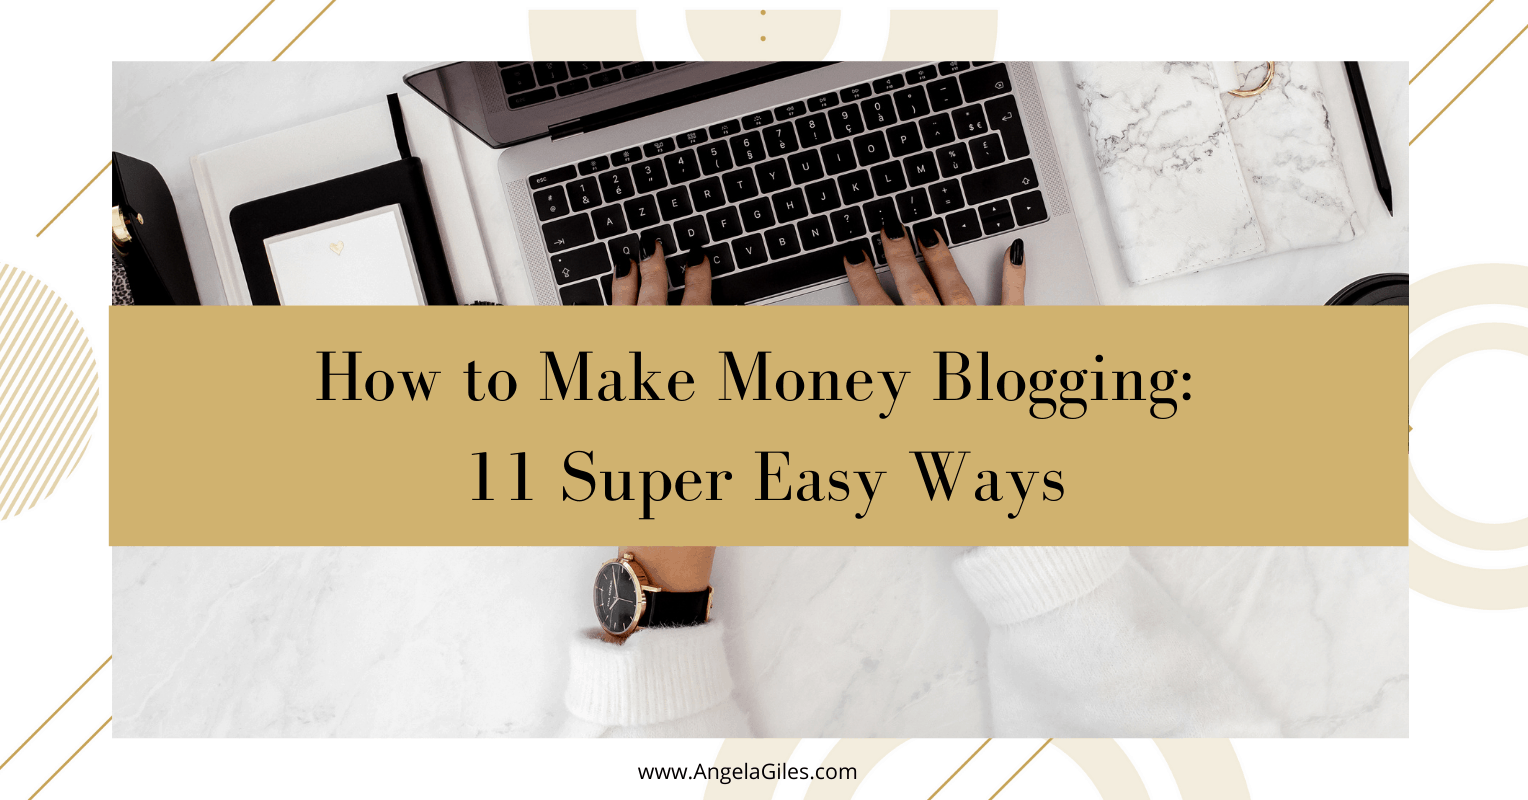 How to Make Money Blogging: 11 Super Easy Ways